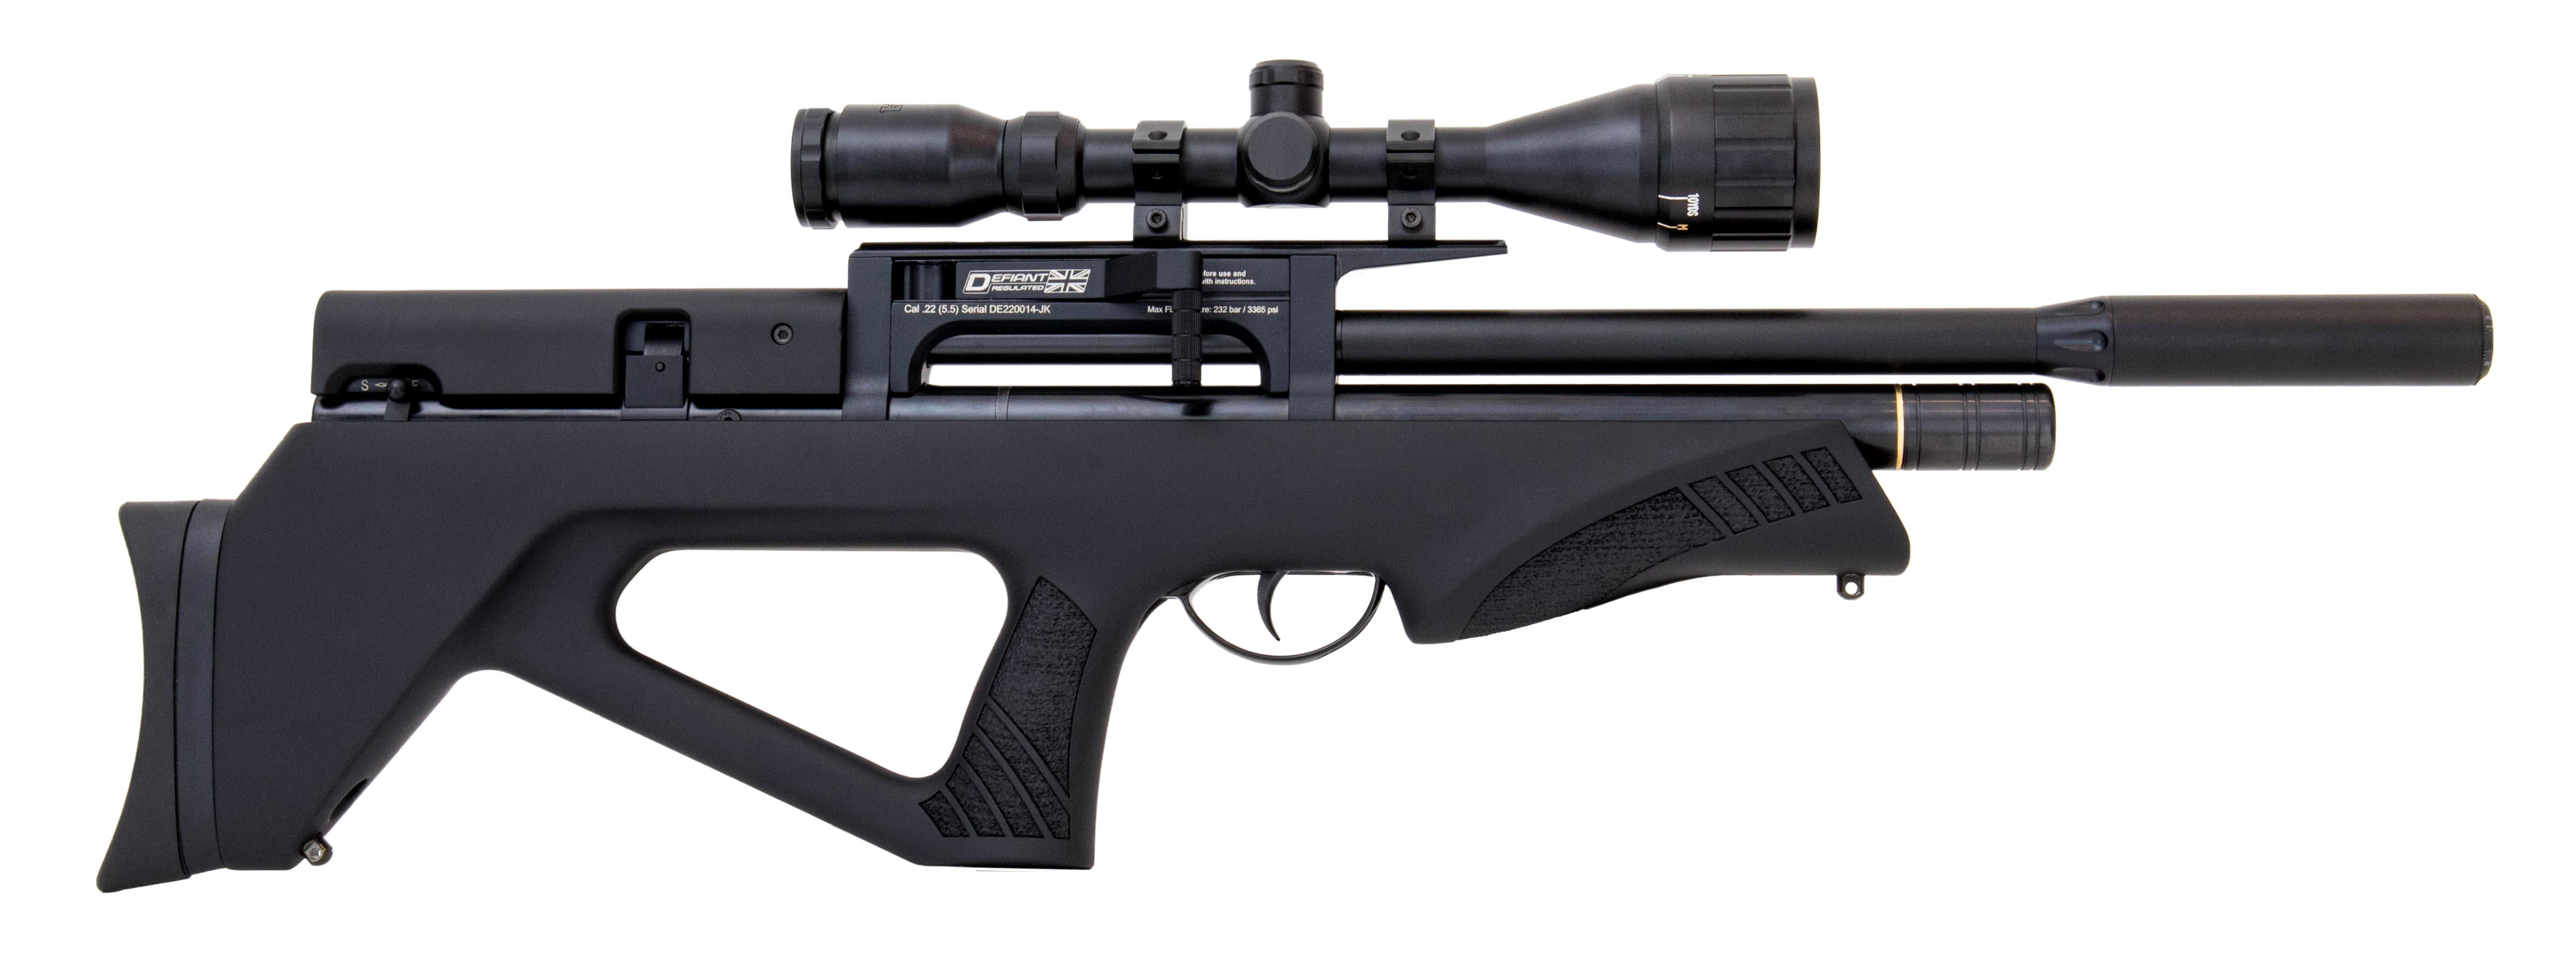 Varmint .177 Caliber Break Barrel Air Rifle   Theisens